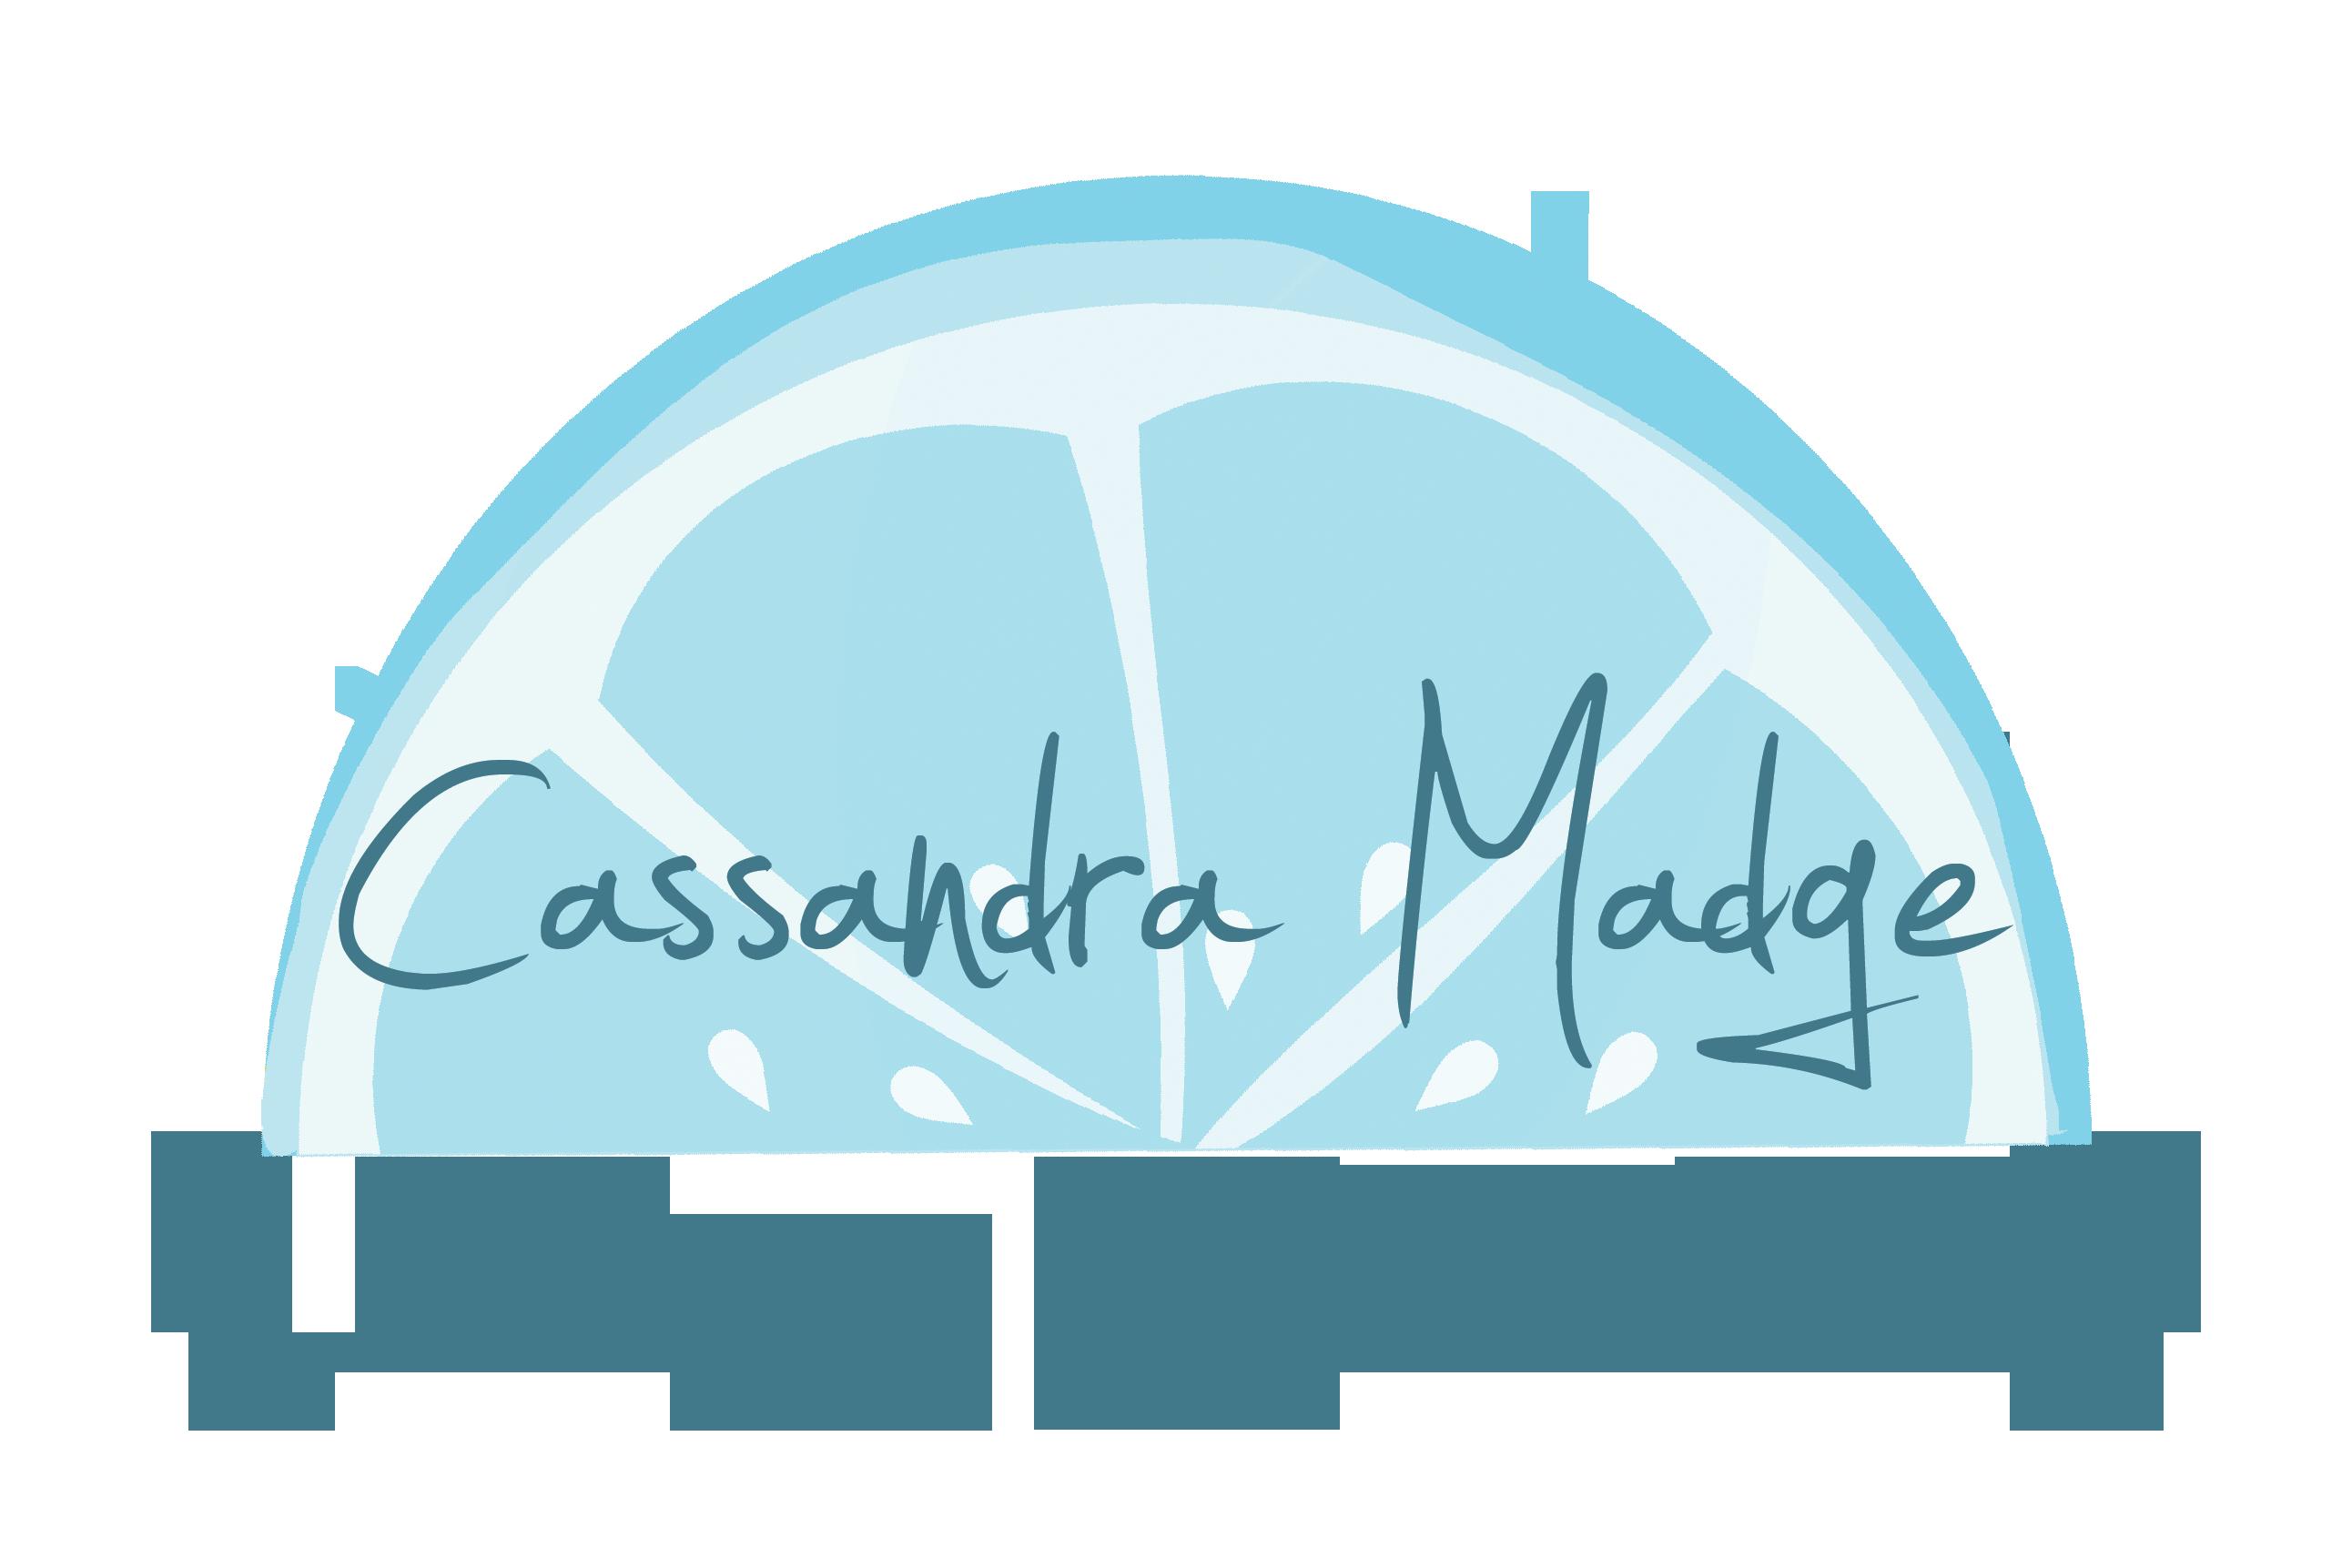 Cassandra Madge